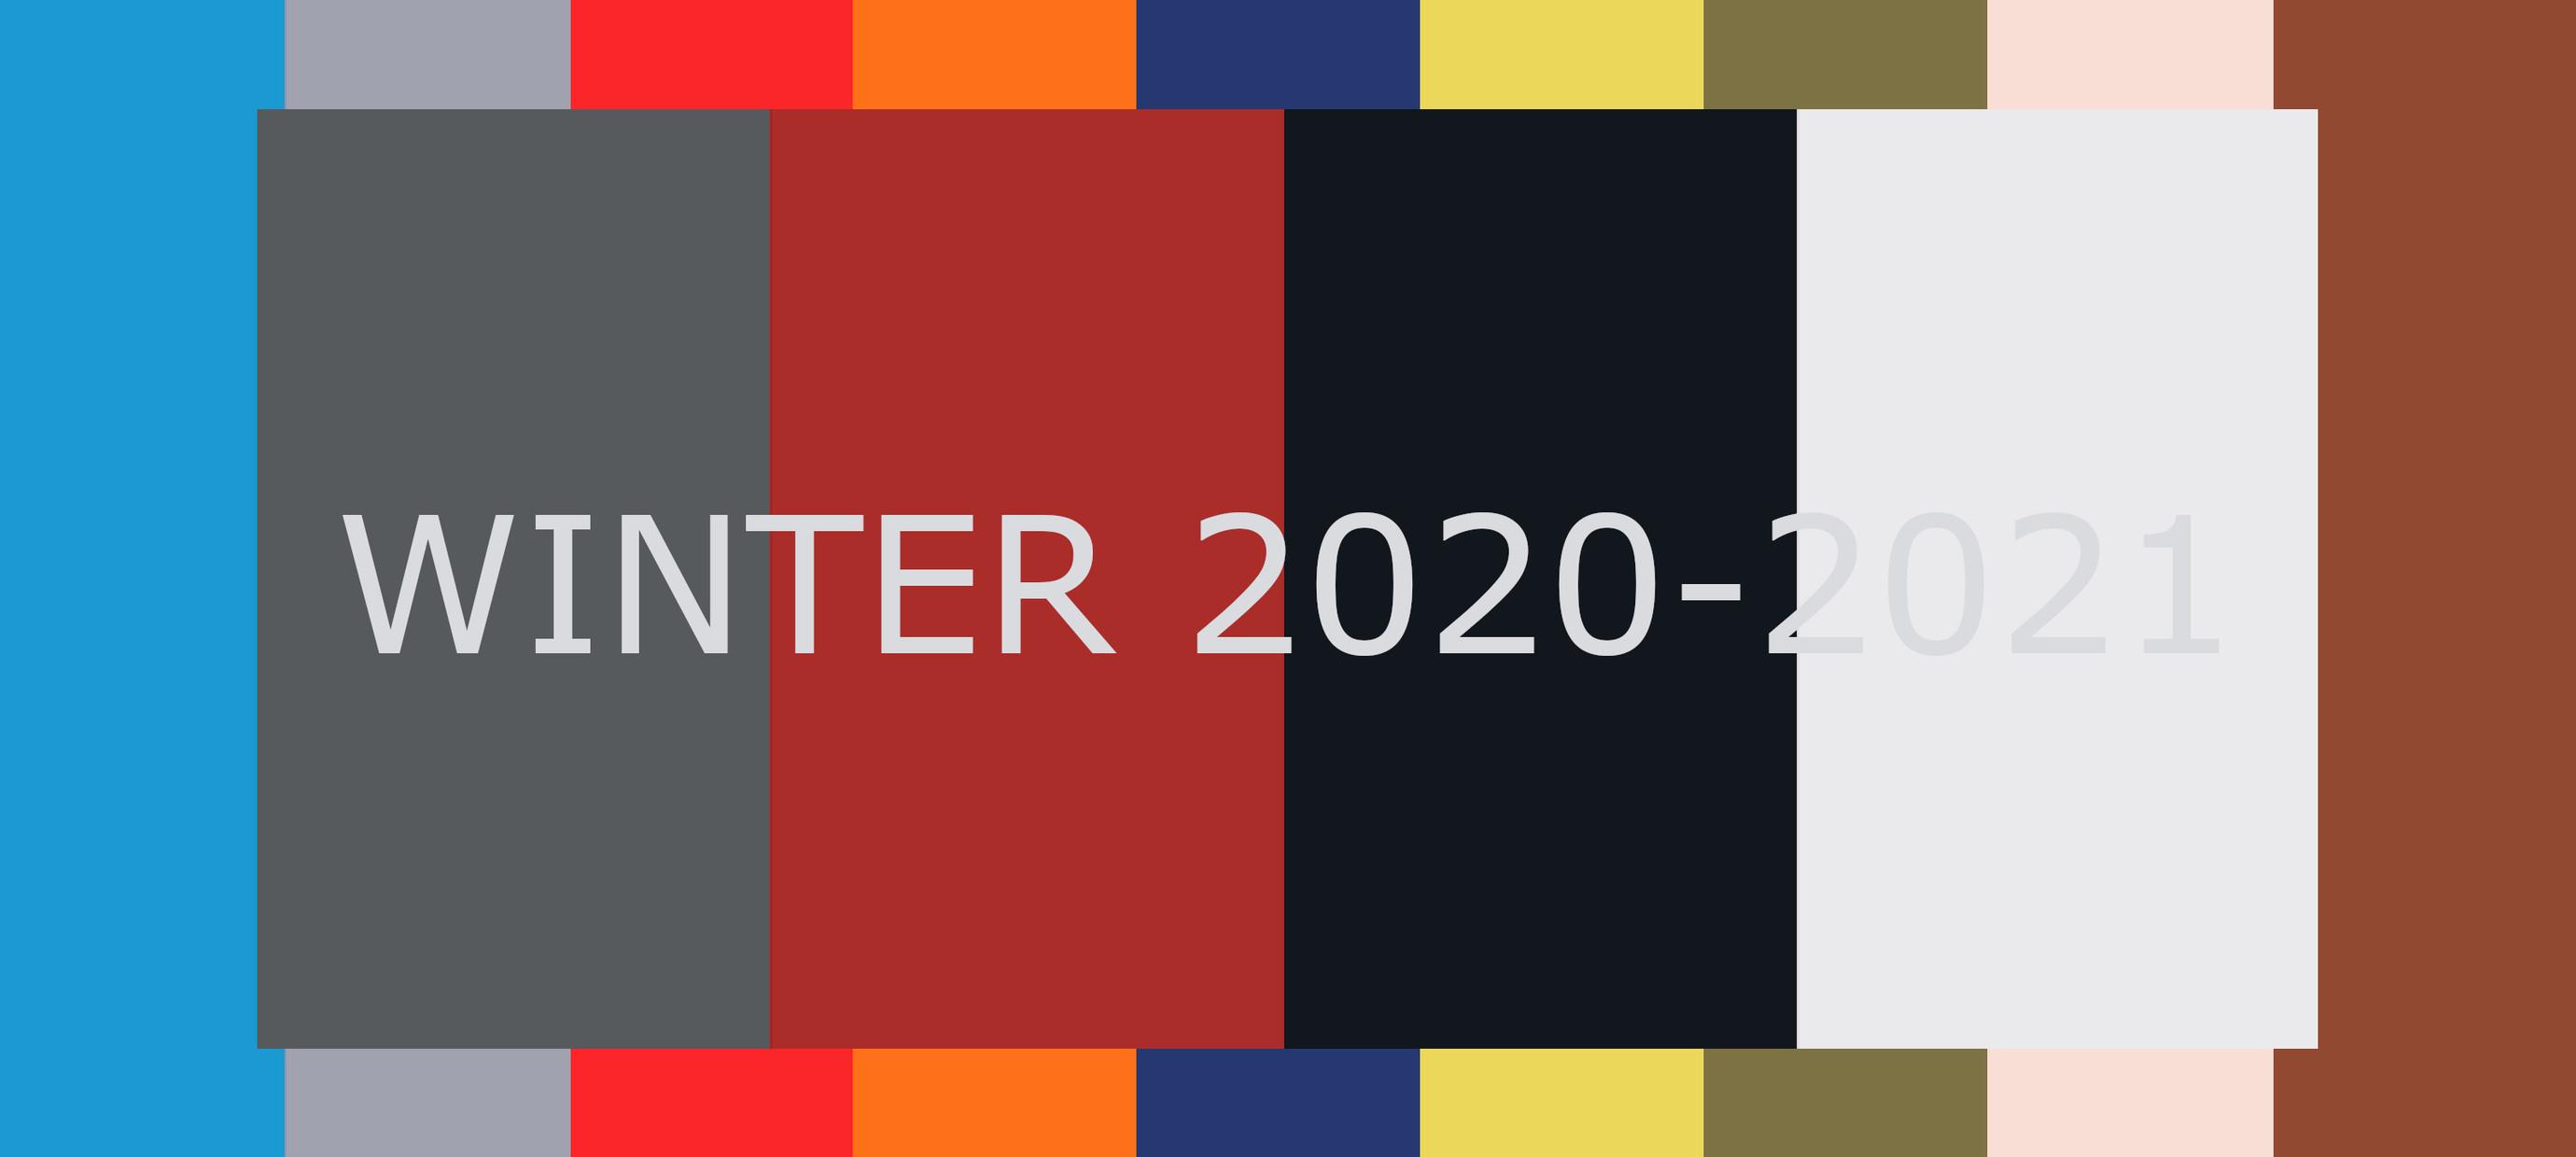 Top 10 Modefarben Winter 2020-2021